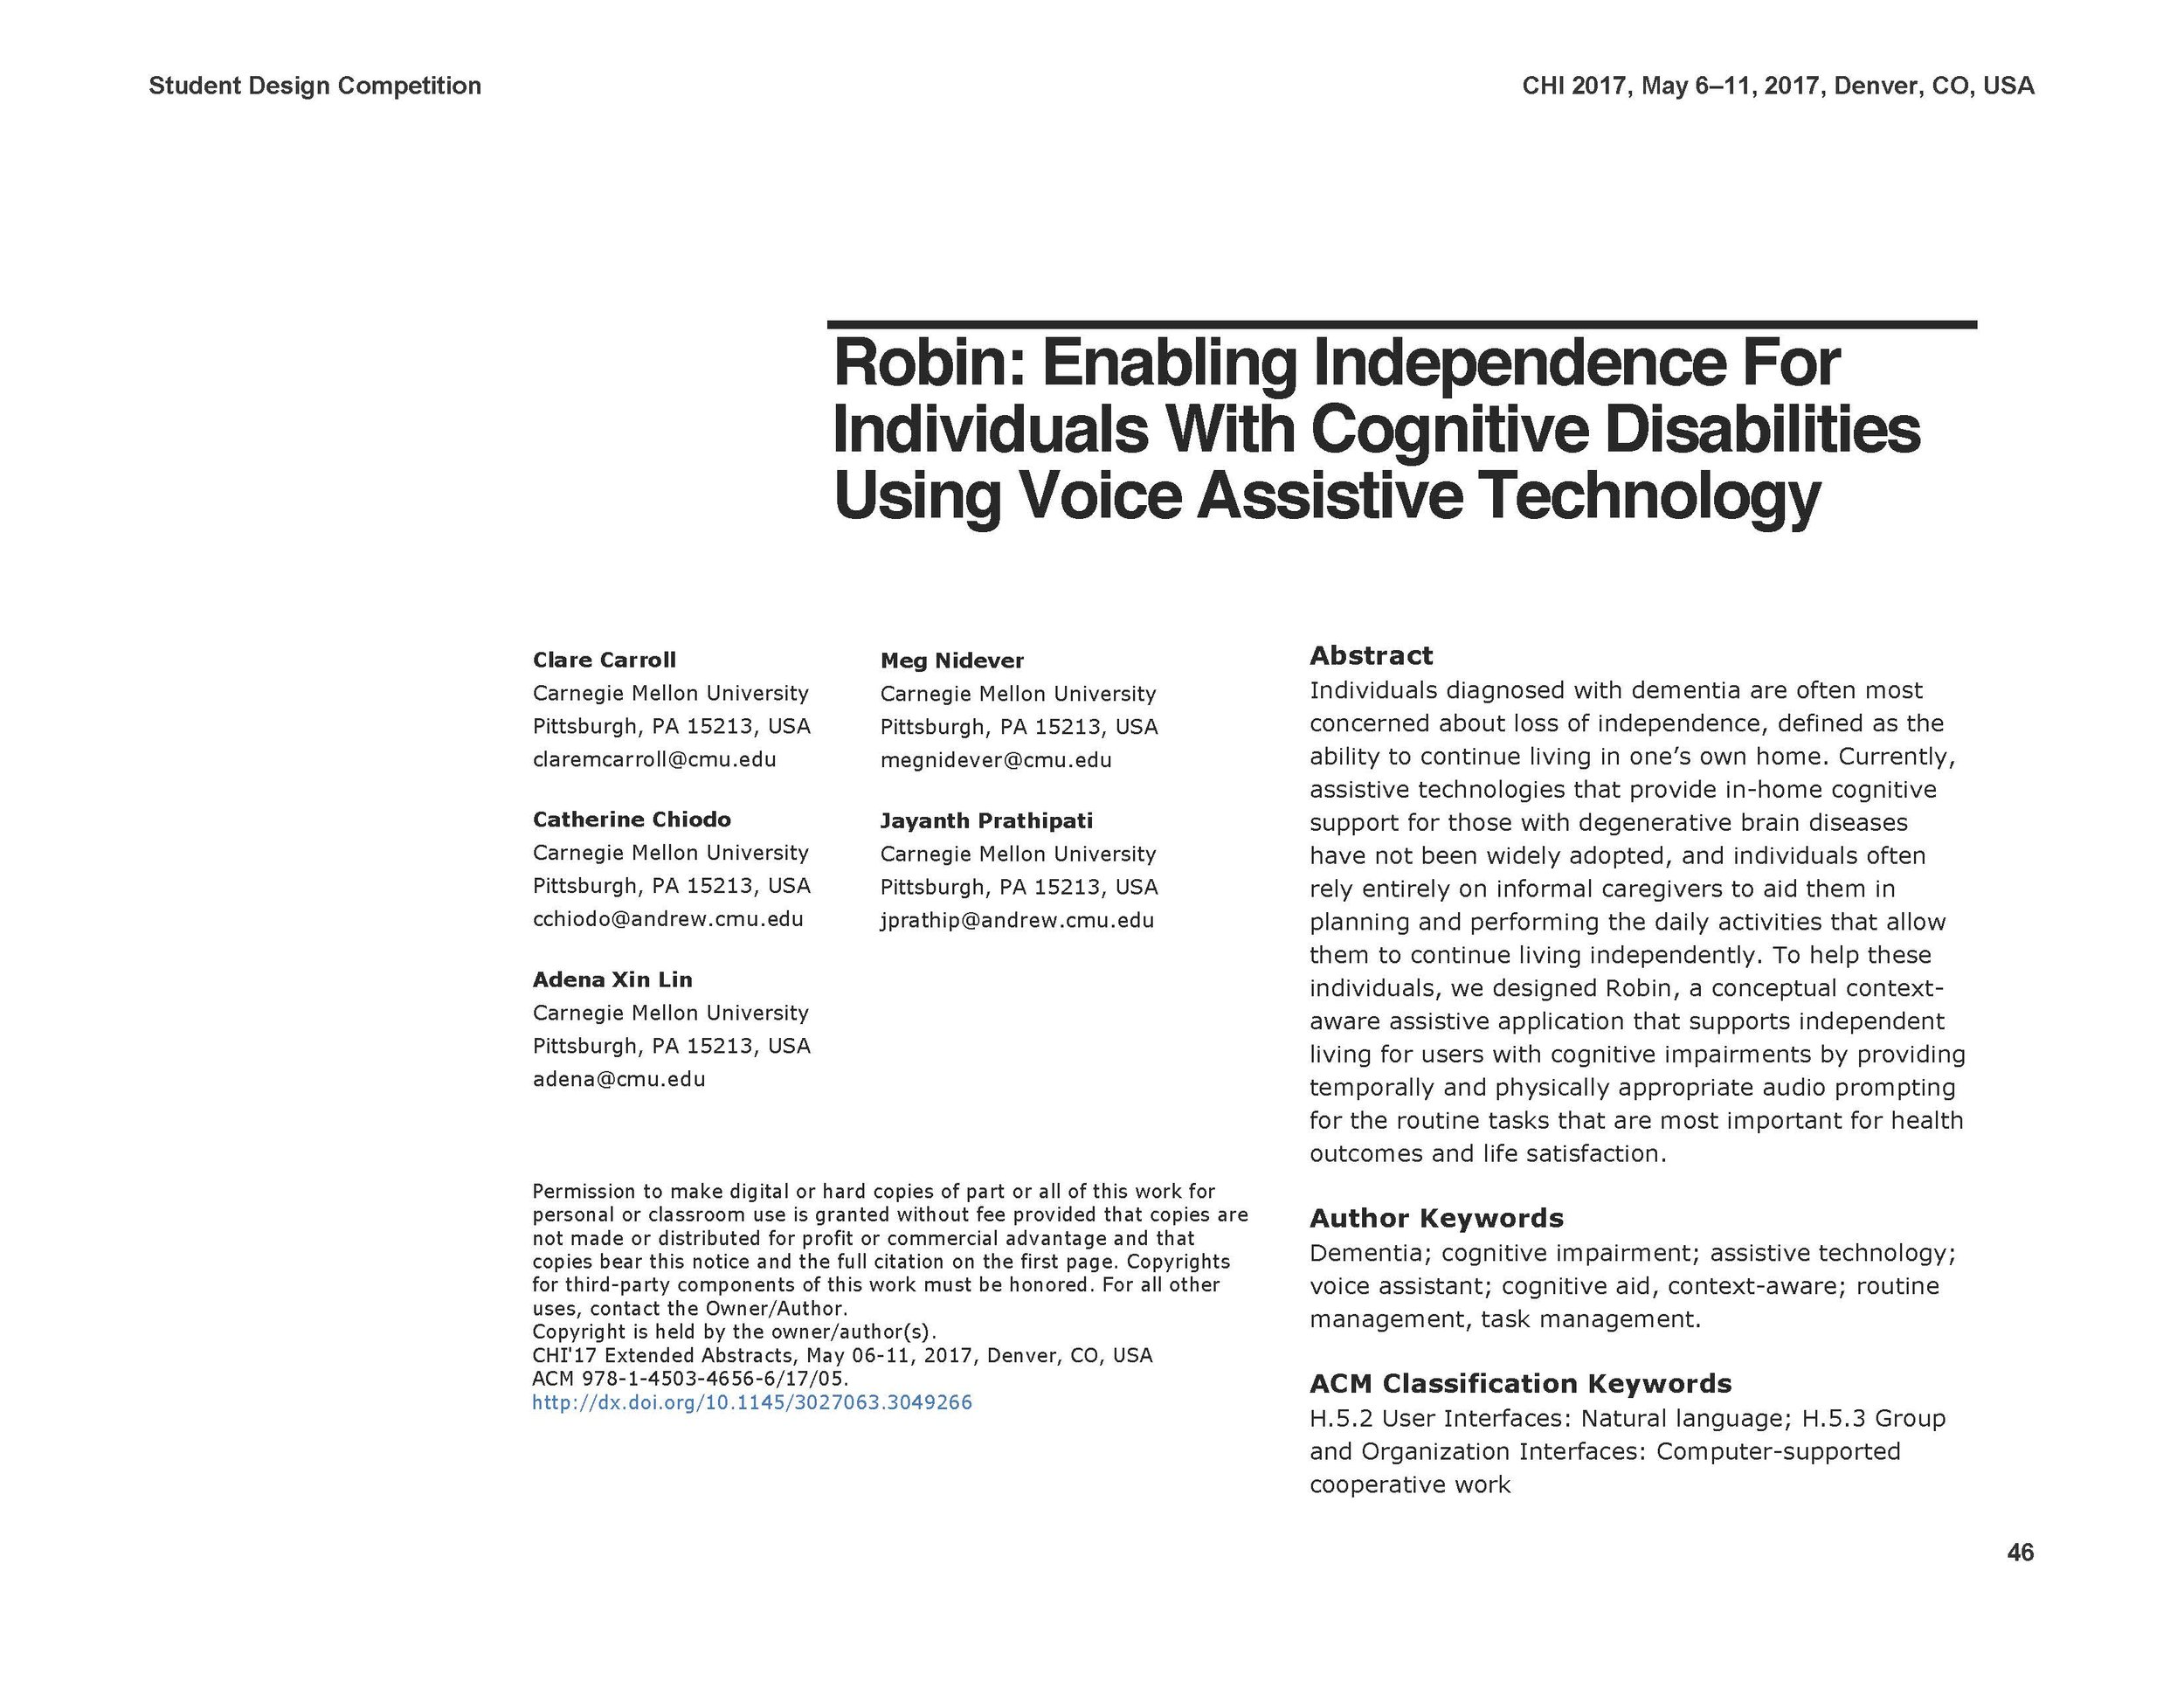 Robin paper final_Page_1.jpg